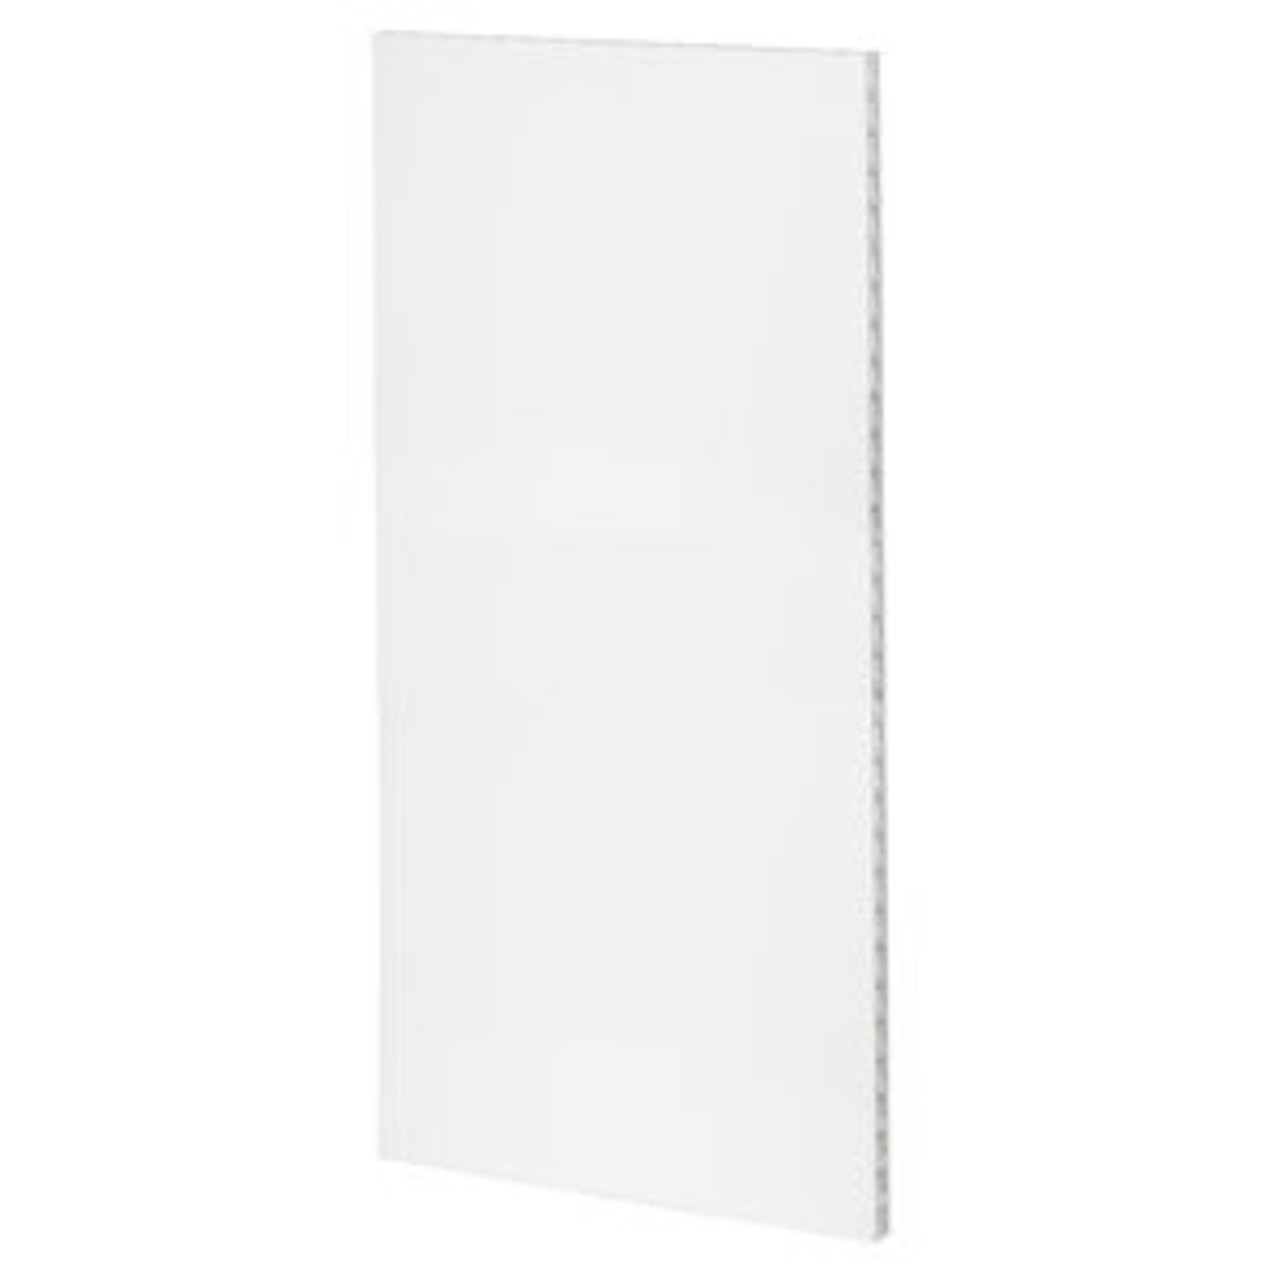 EverPanel 8' x 3' Panel